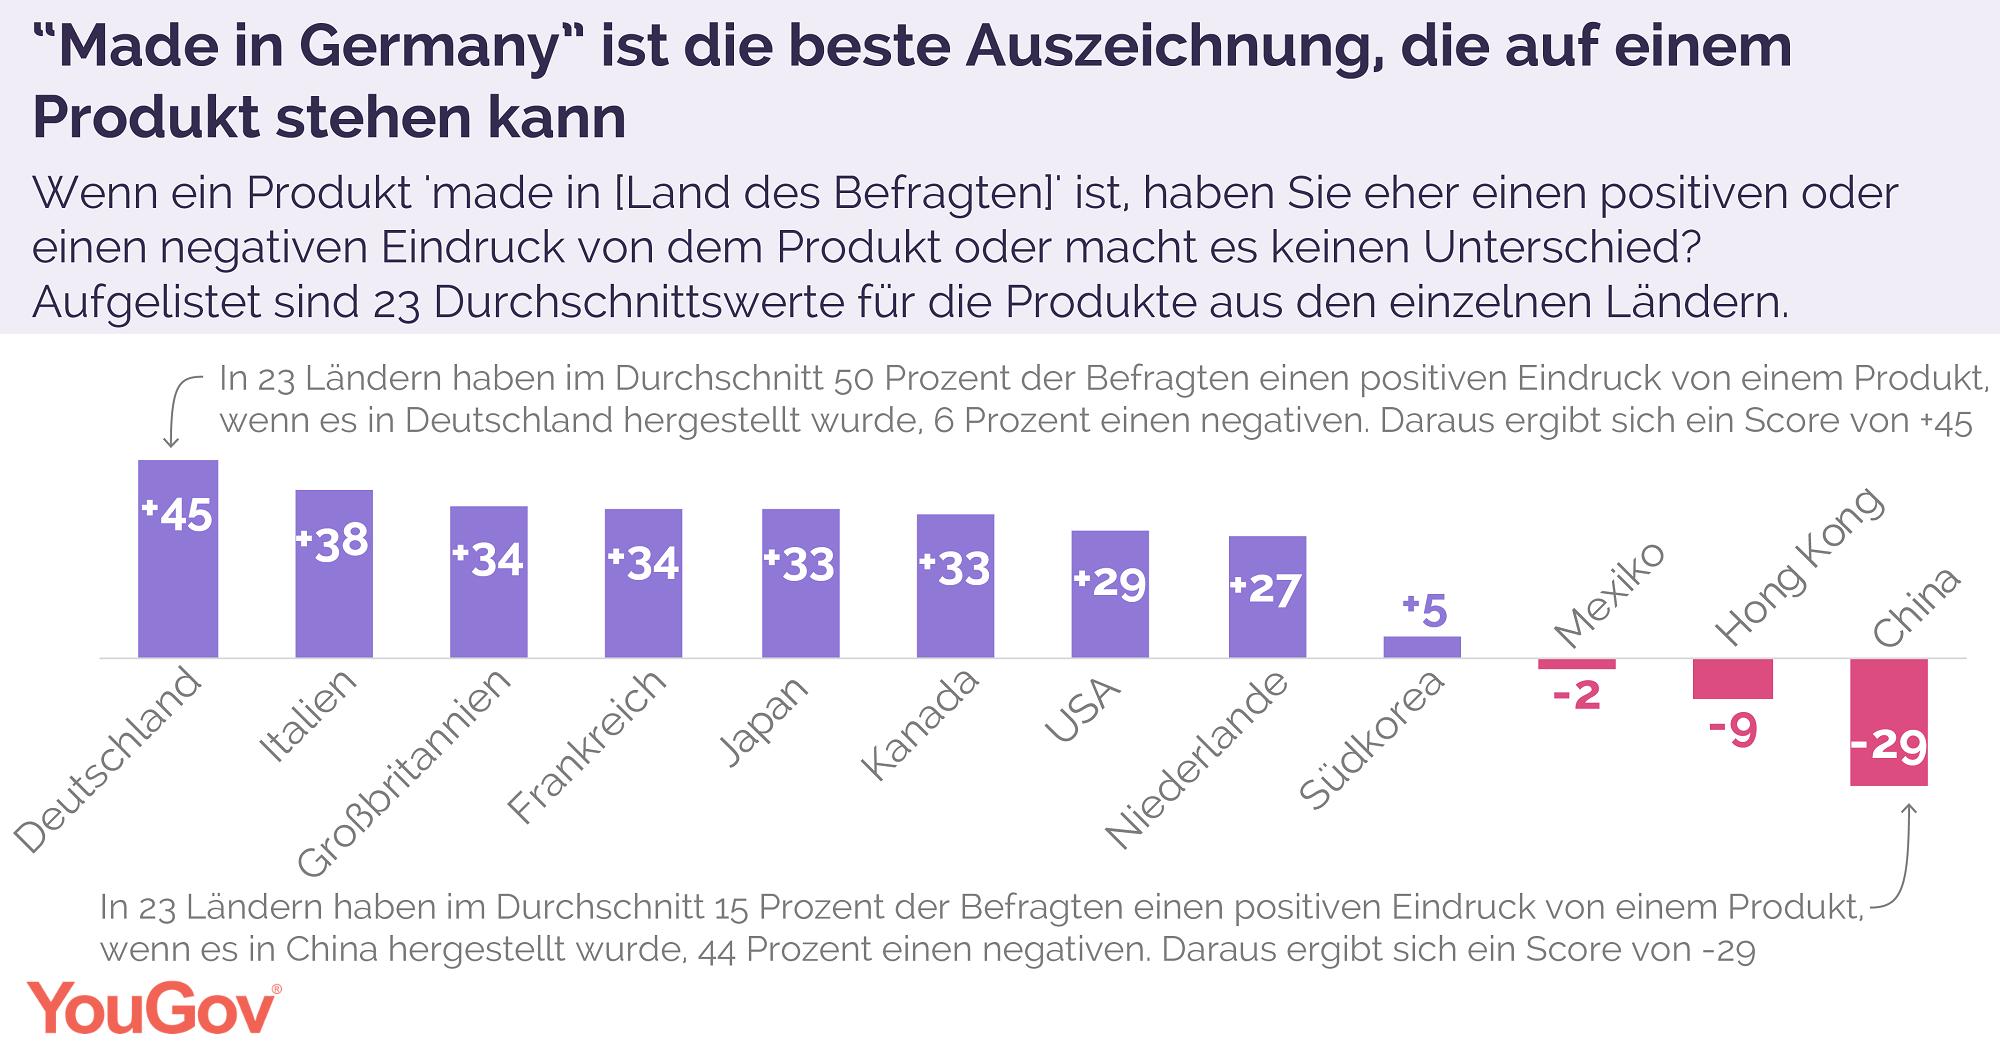 Grafik 1 zum Thema Made In Germany